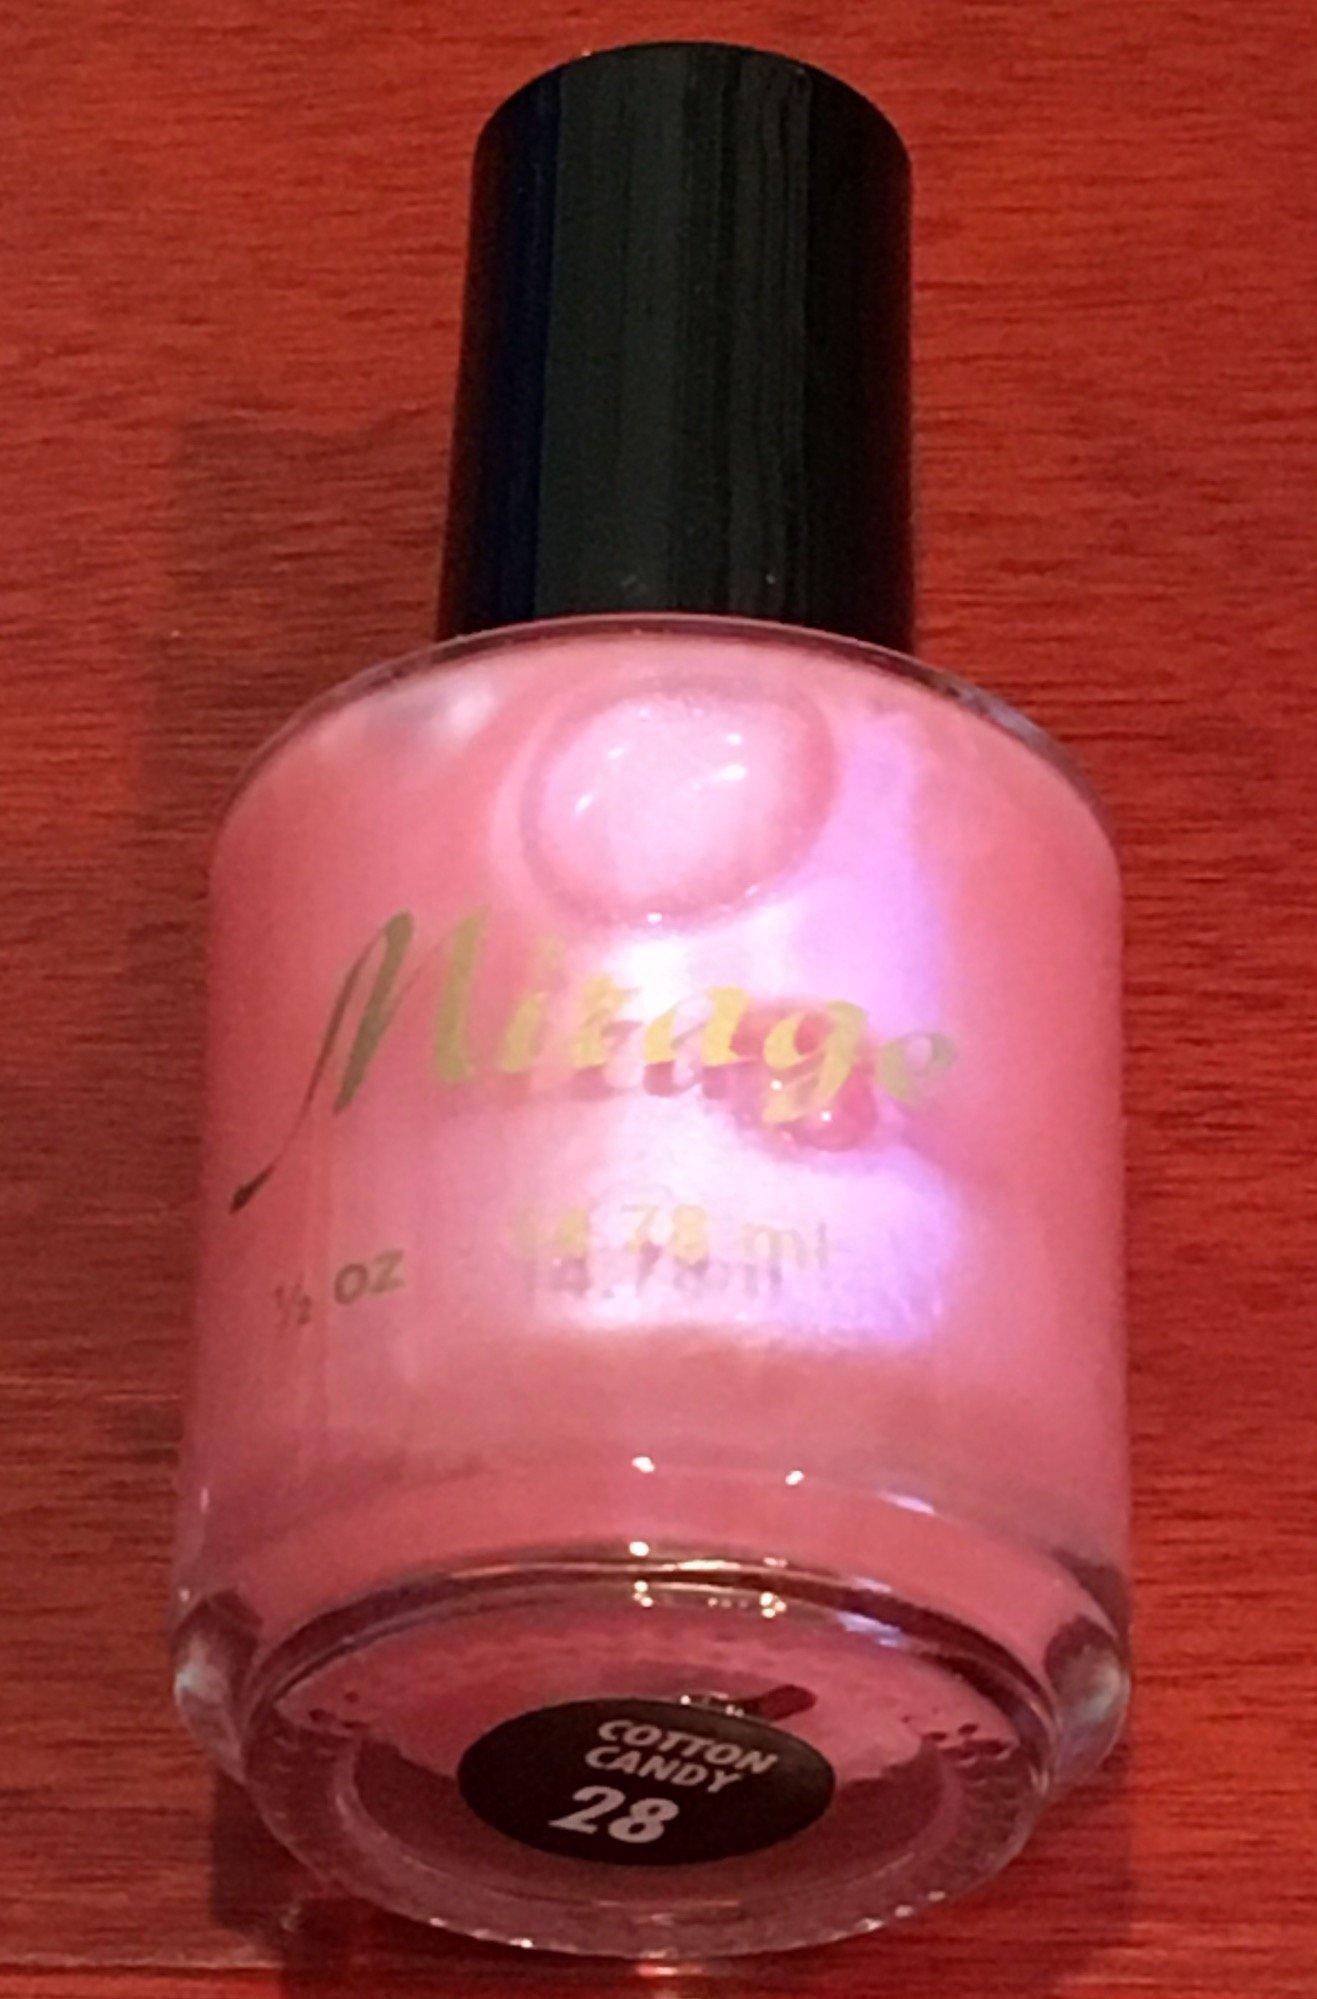 Amazon.com: Sation Nail Polish Cotton Candy 77 .5oz: Health ...